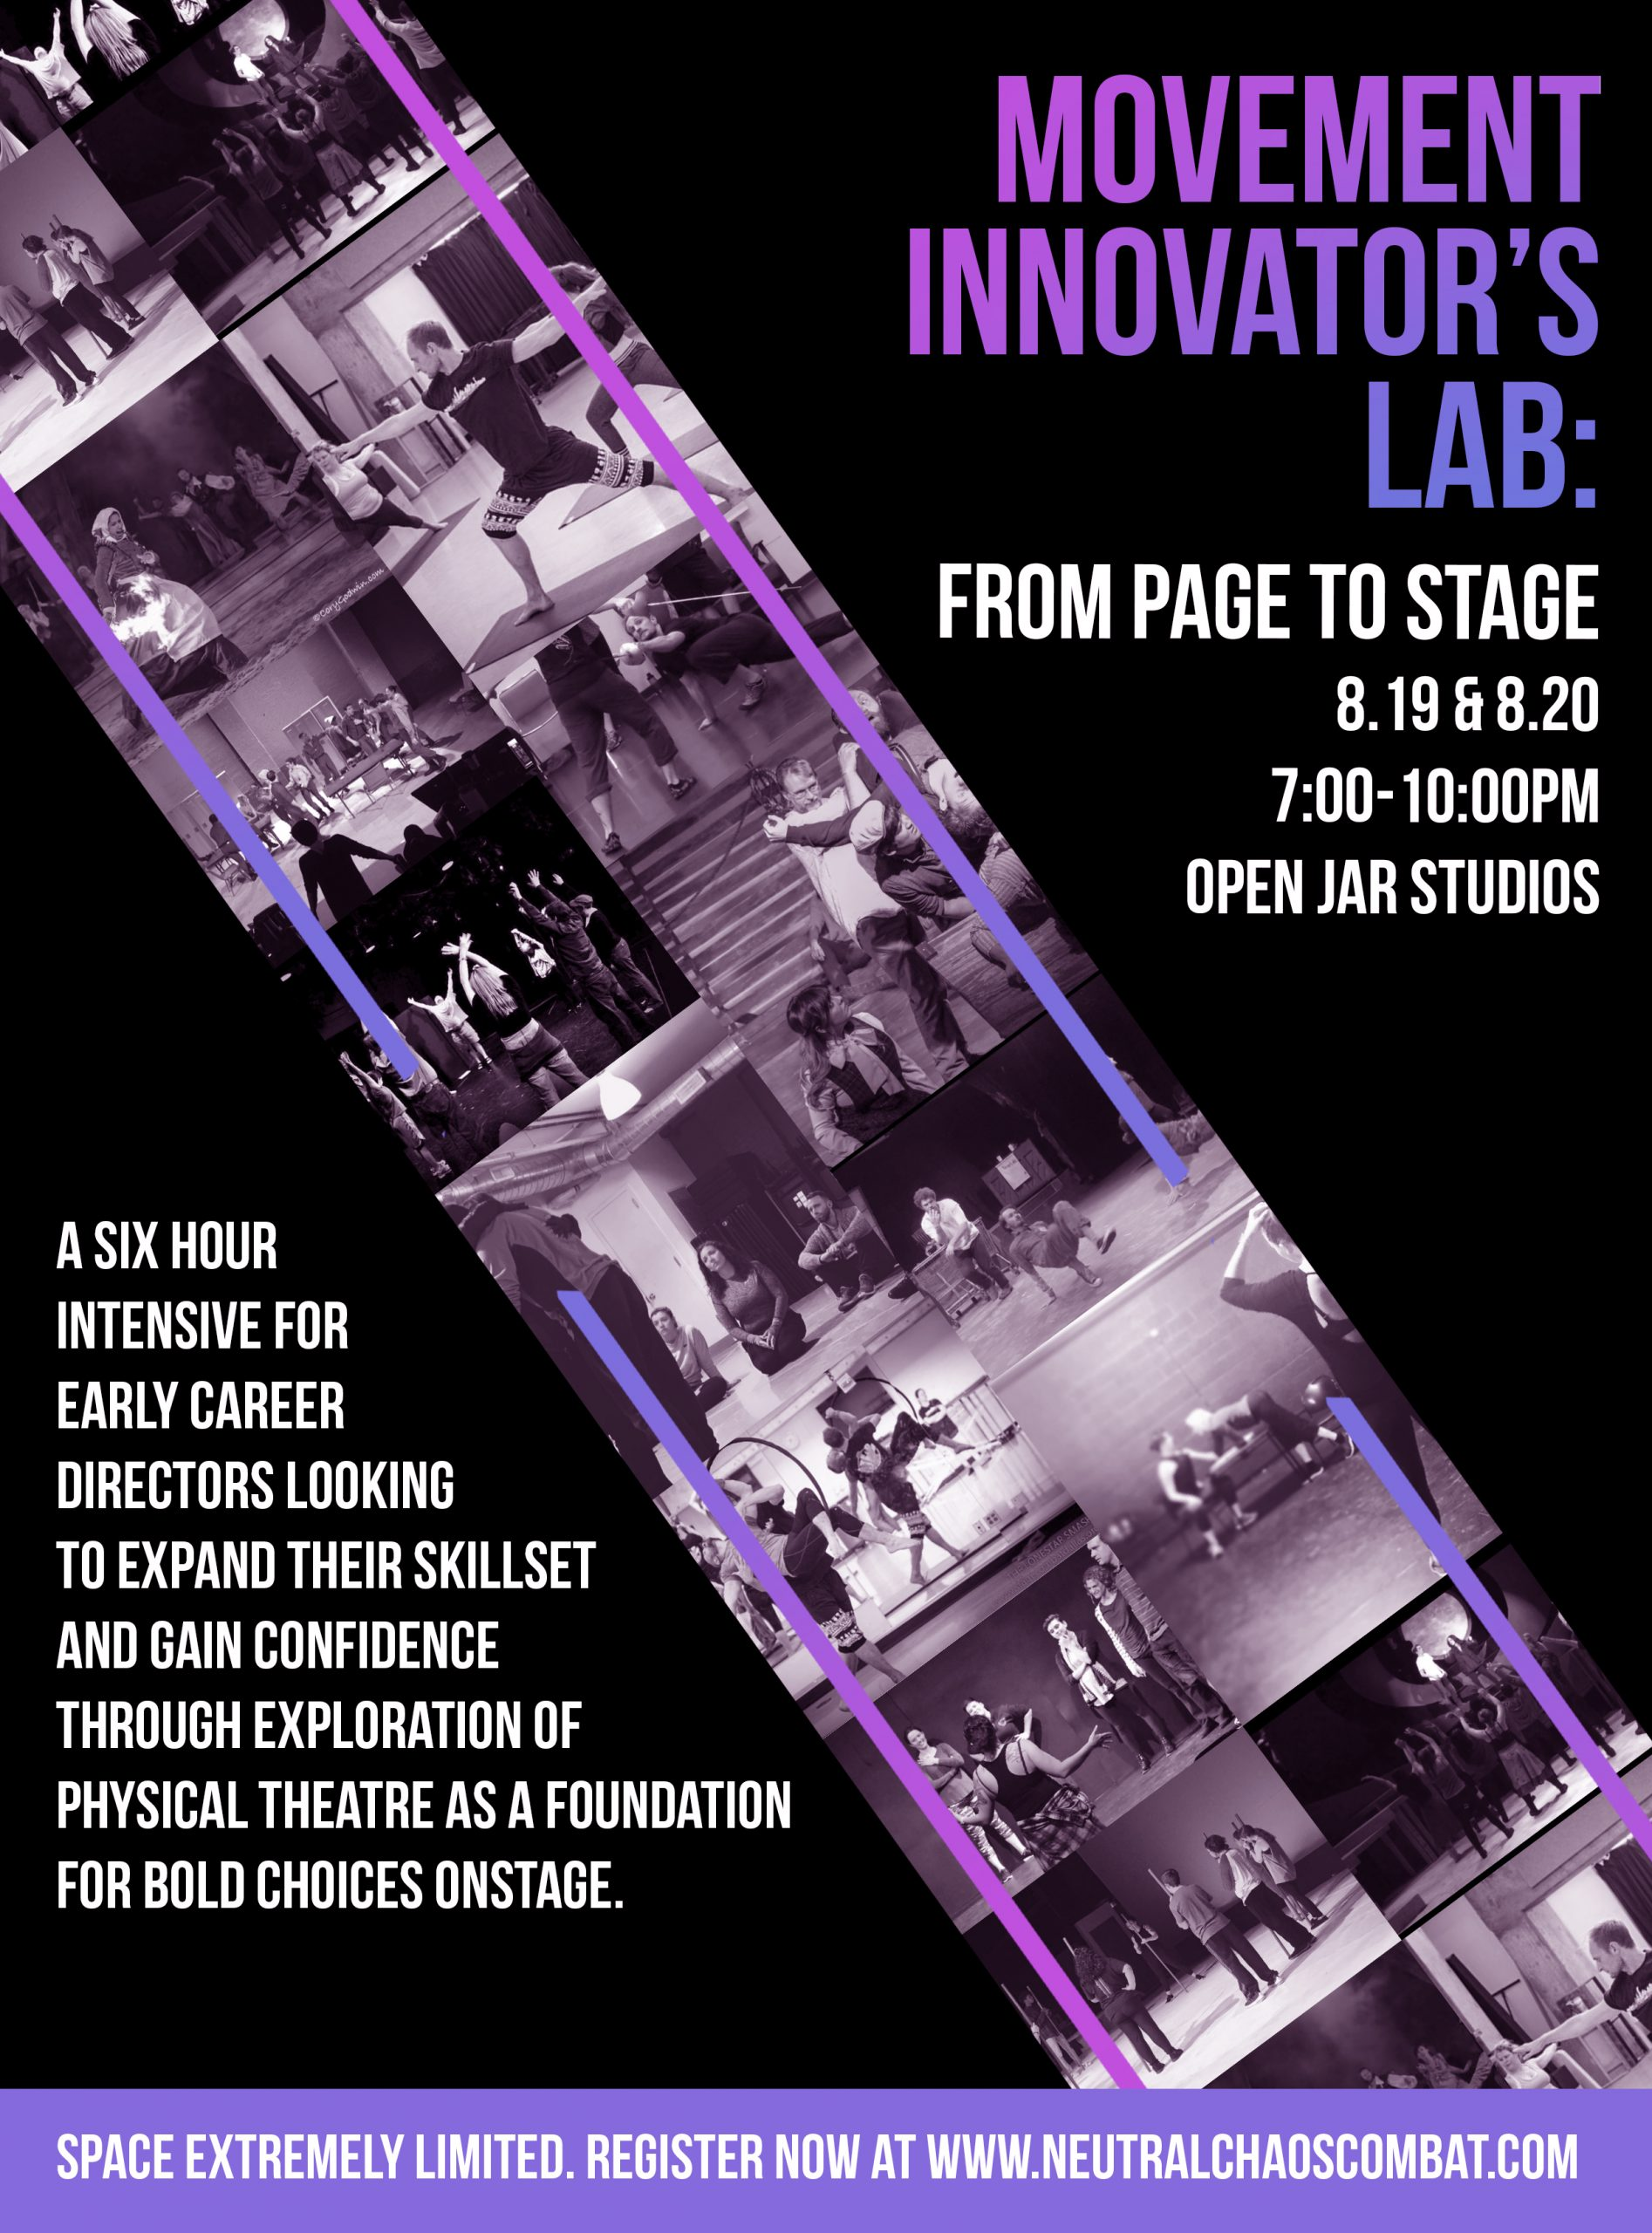 Movement innovator's lab